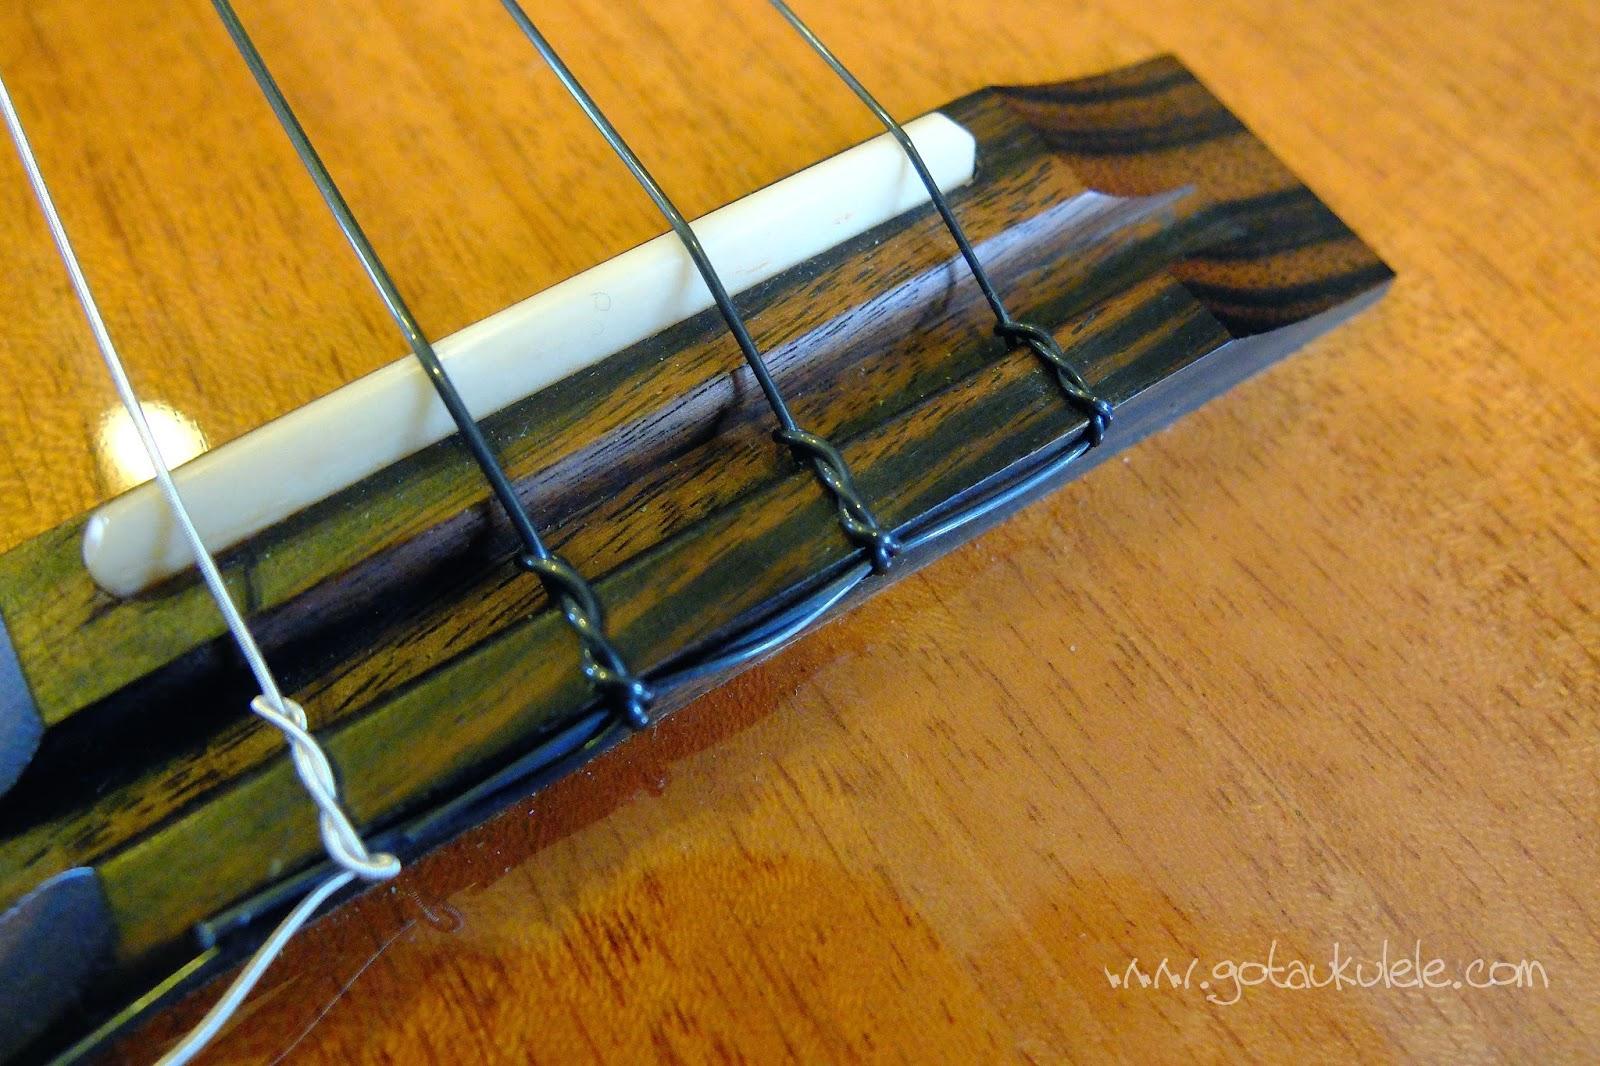 Aquila Lava Ukulele Strings on Pono bridge